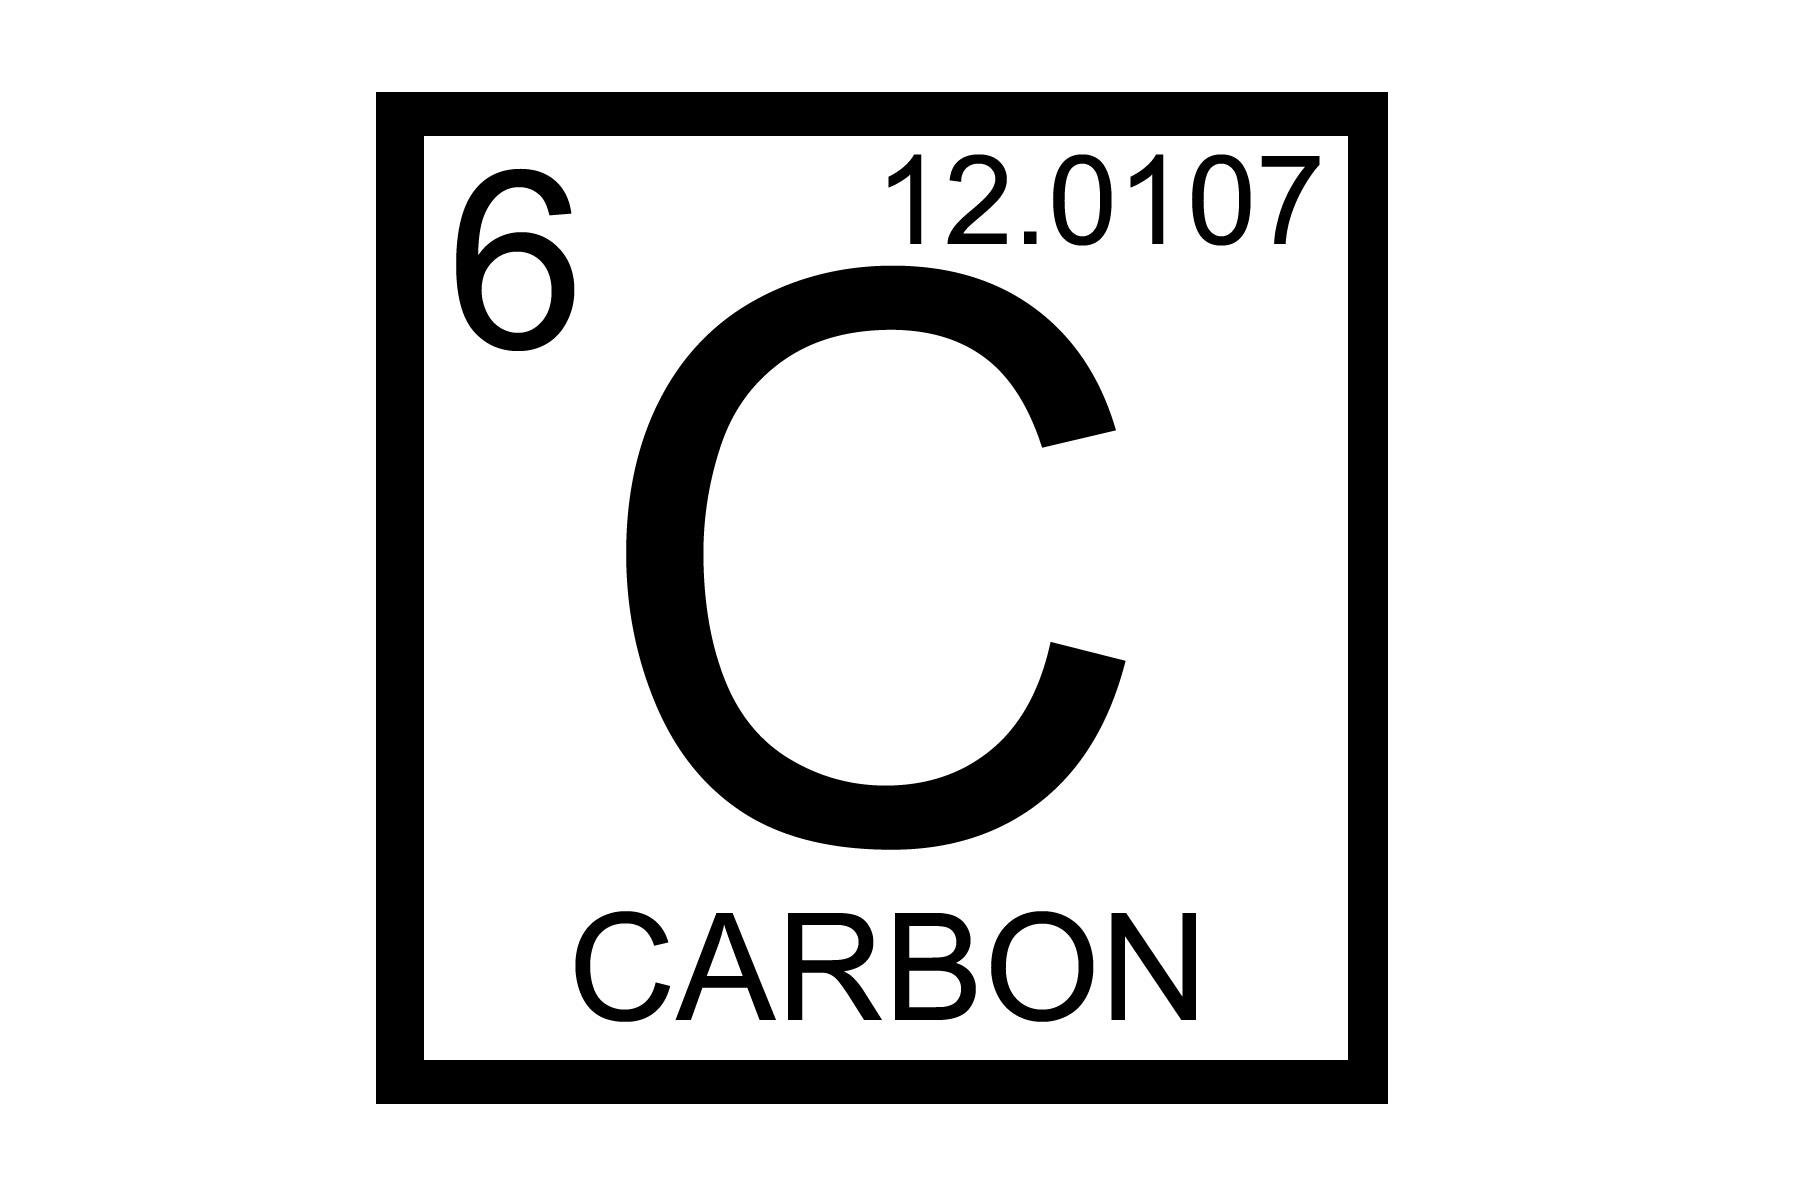 Carbon symbol periodic table gallery periodic table images periodic table of elements carbon image collections periodic carbon element periodic table images periodic table images gamestrikefo Images